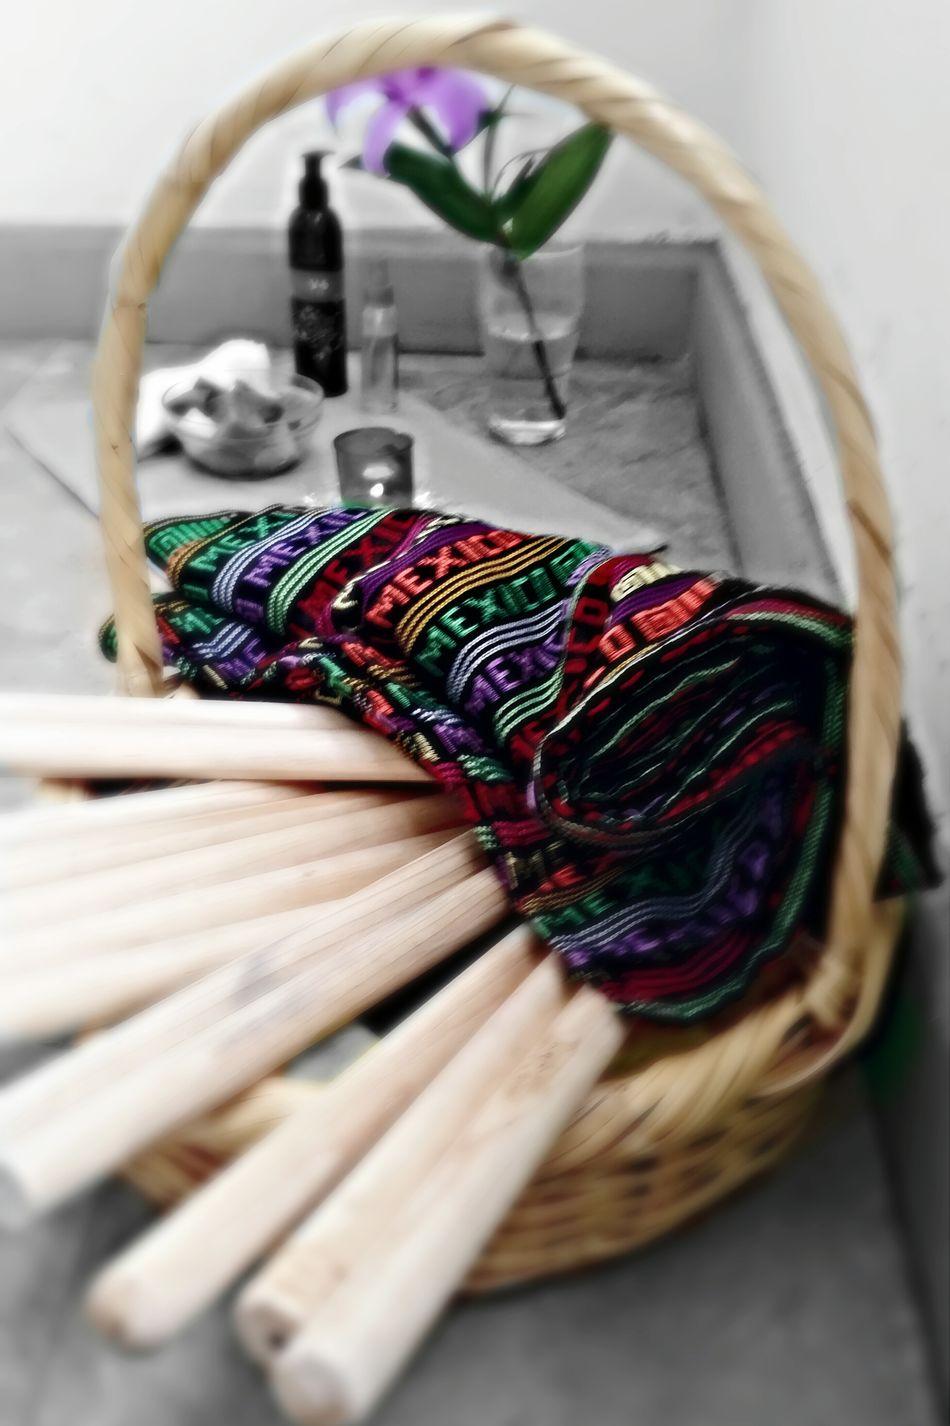 Rebozo Spa Zurely Masaje Relaxing Mexico Mexico De Mis Amores Mexican Culture Mexicolors Working